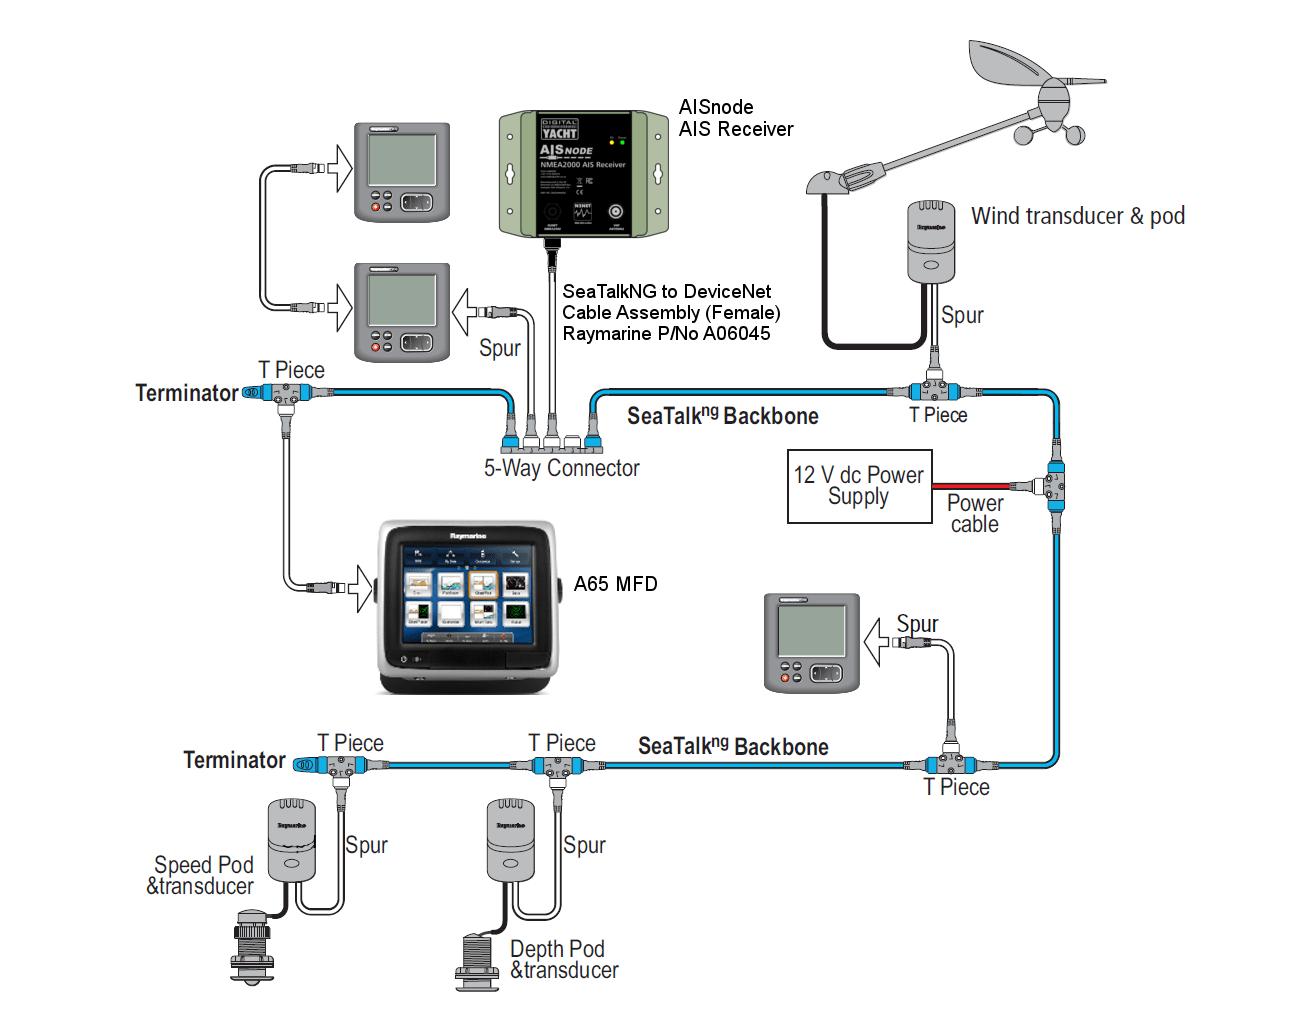 Boat Stereo Installation Wiring Diagram Trusted Diagrams 12 Volt Schematic Raymarine E120 Gps Schematics U2022 Small